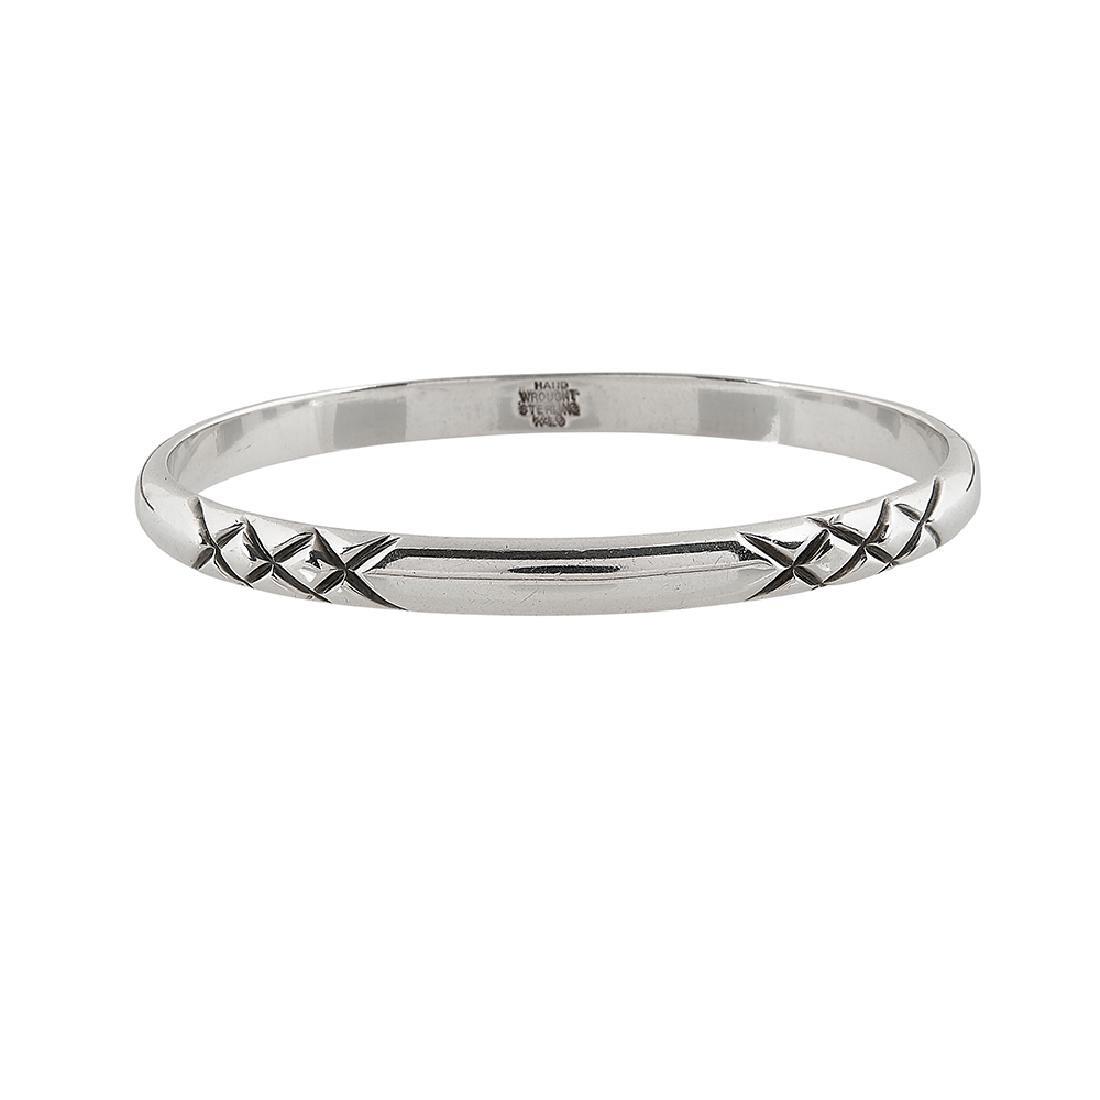 The Kalo Shop bangle bracelet